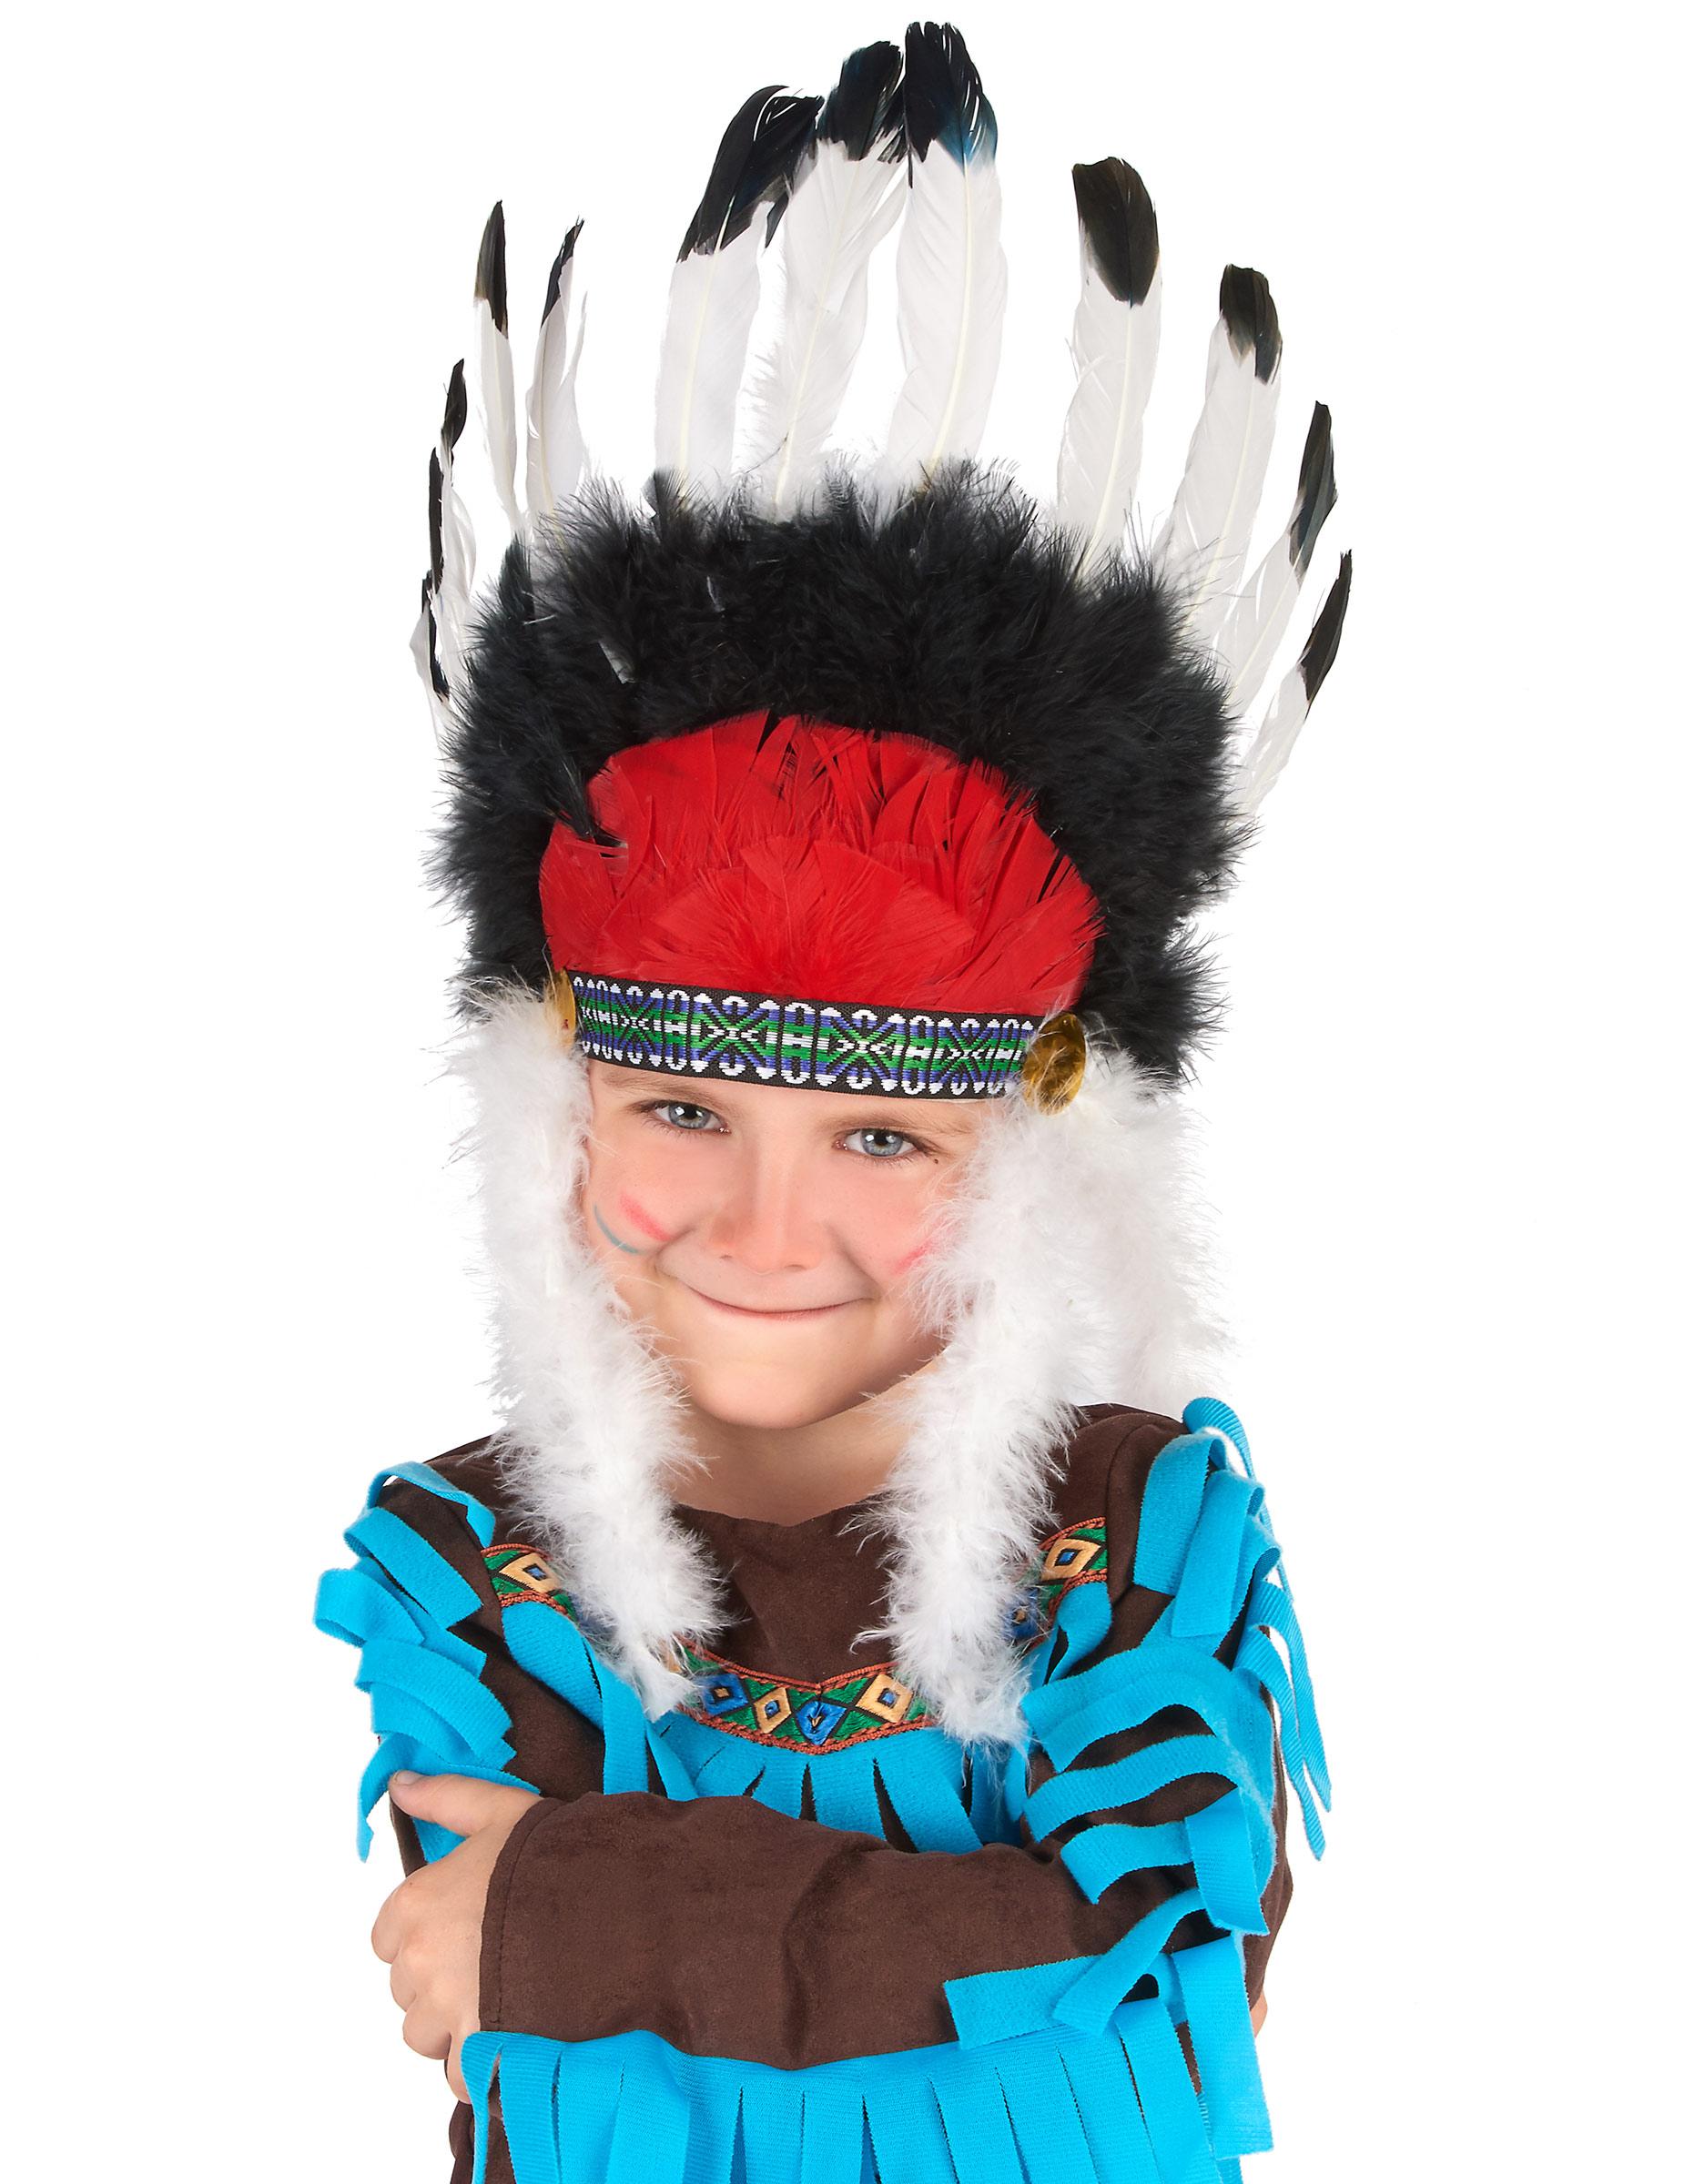 indianer h uptling kopfschmuck federschmuck f r kinder weiss schwarz rot g nstige faschings. Black Bedroom Furniture Sets. Home Design Ideas